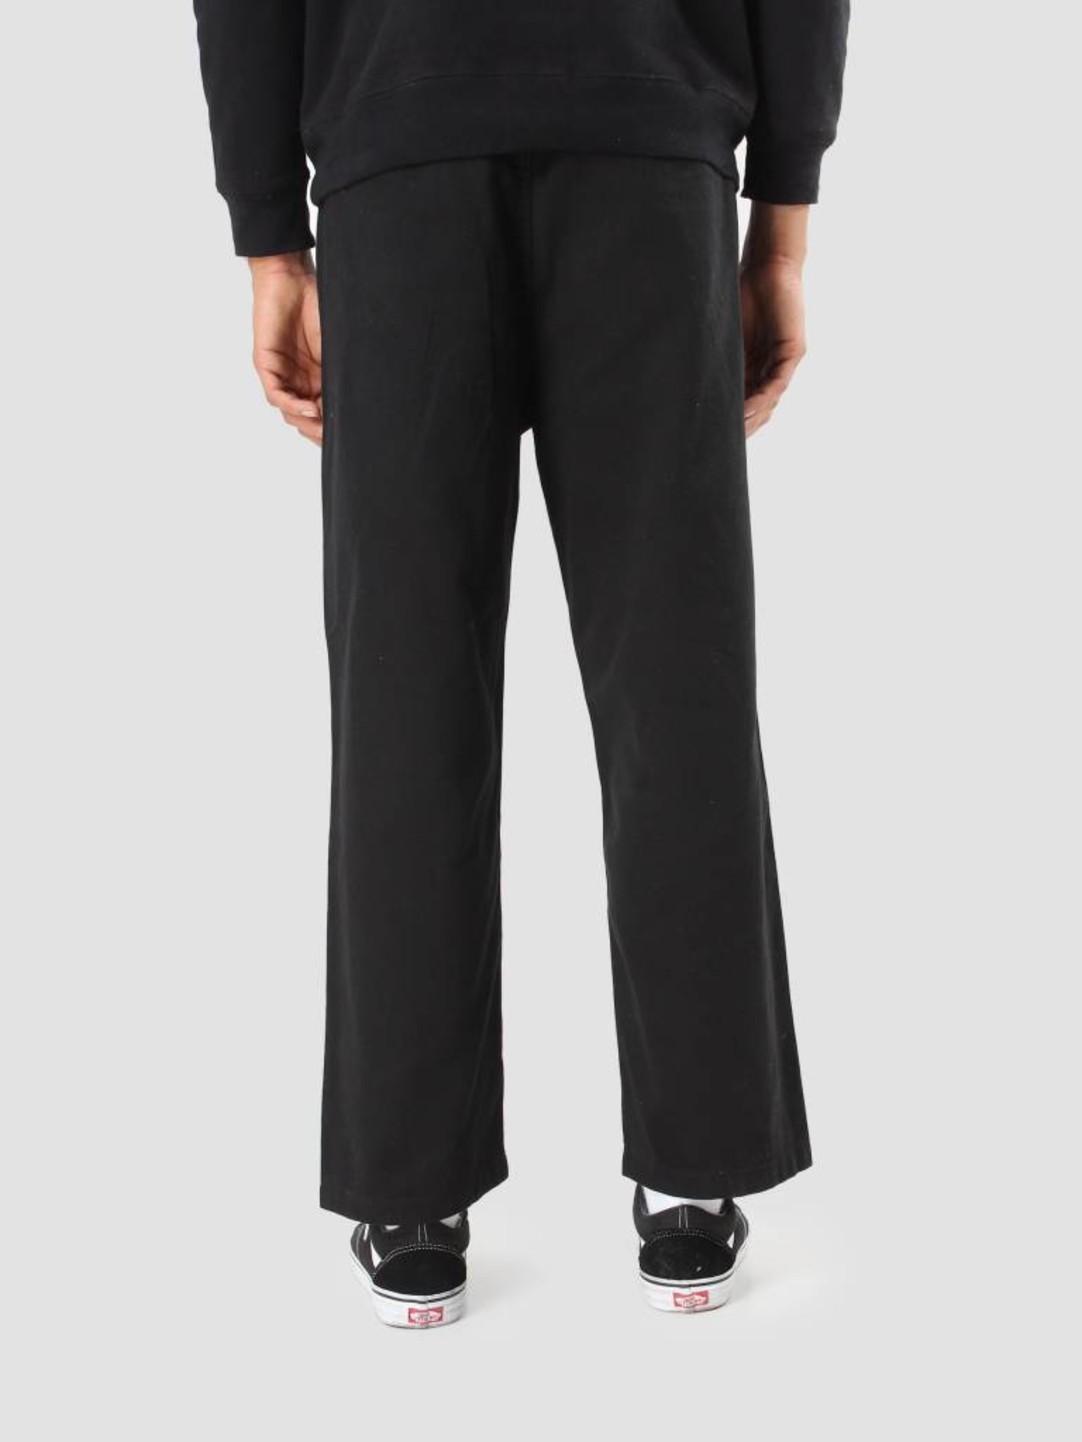 Obey Obey Loiter Big Fits Pant Black 142020099